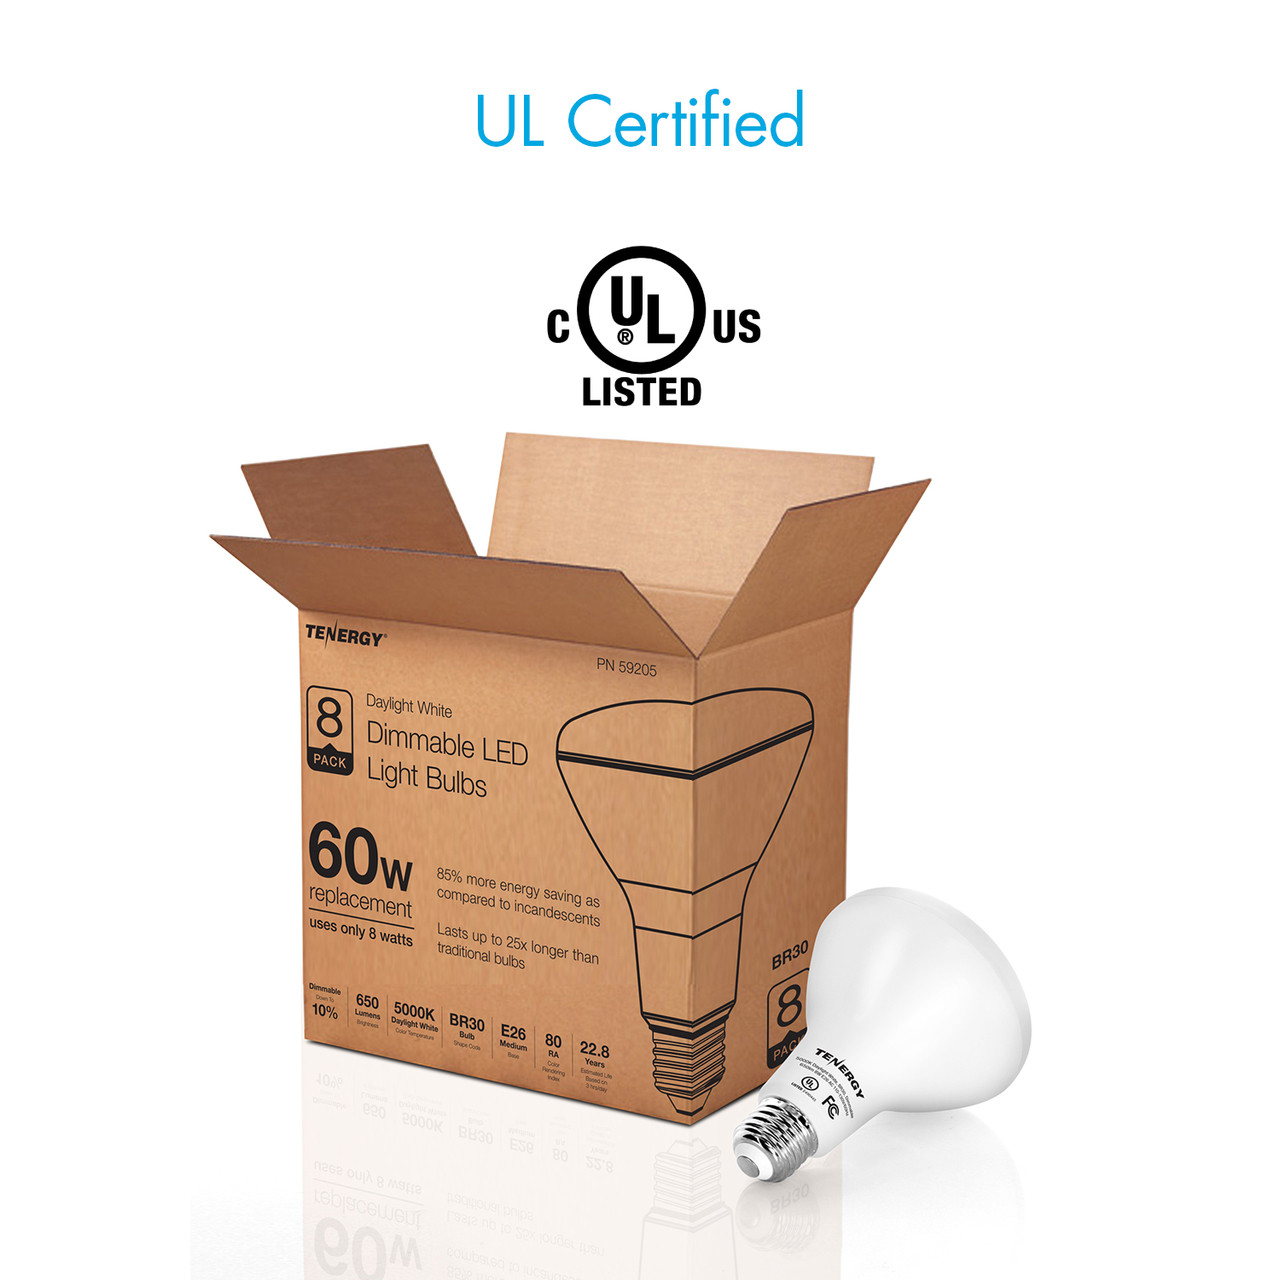 8W Dimmable LED Flood Light 5000K (Daylight White)